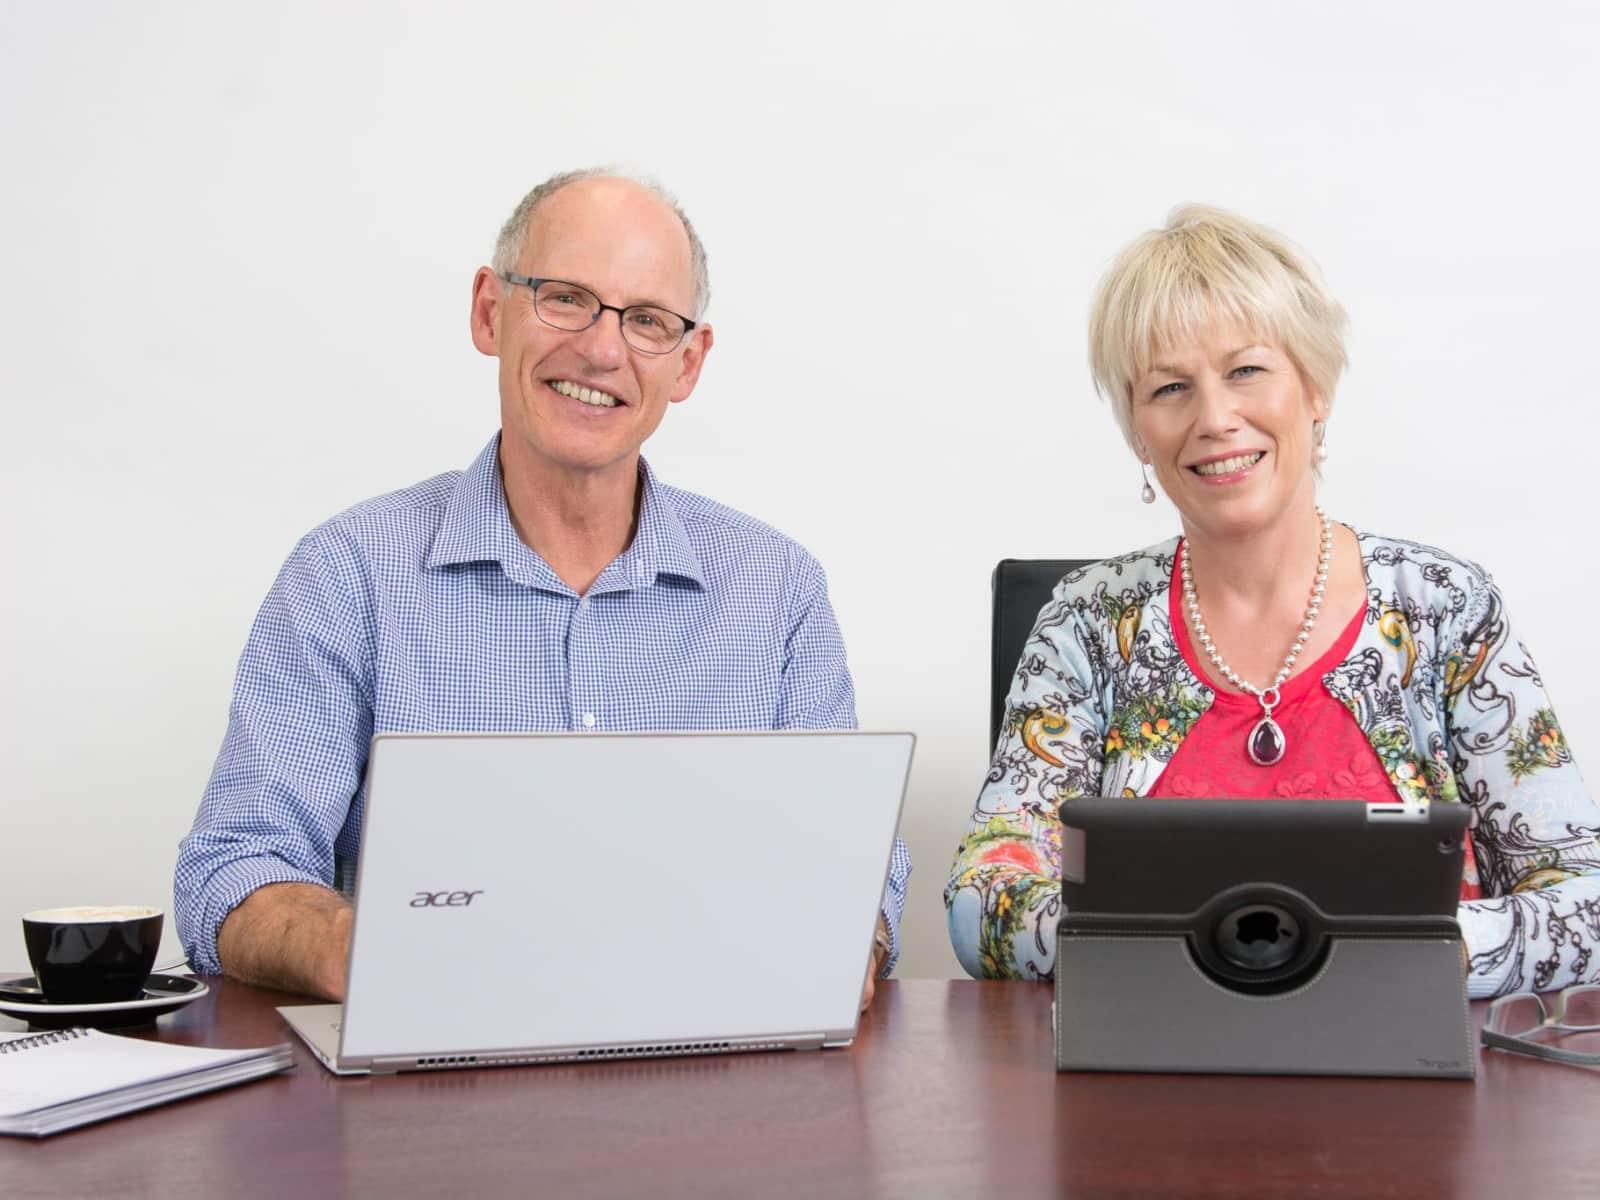 Debbie & Ian from Christchurch, New Zealand